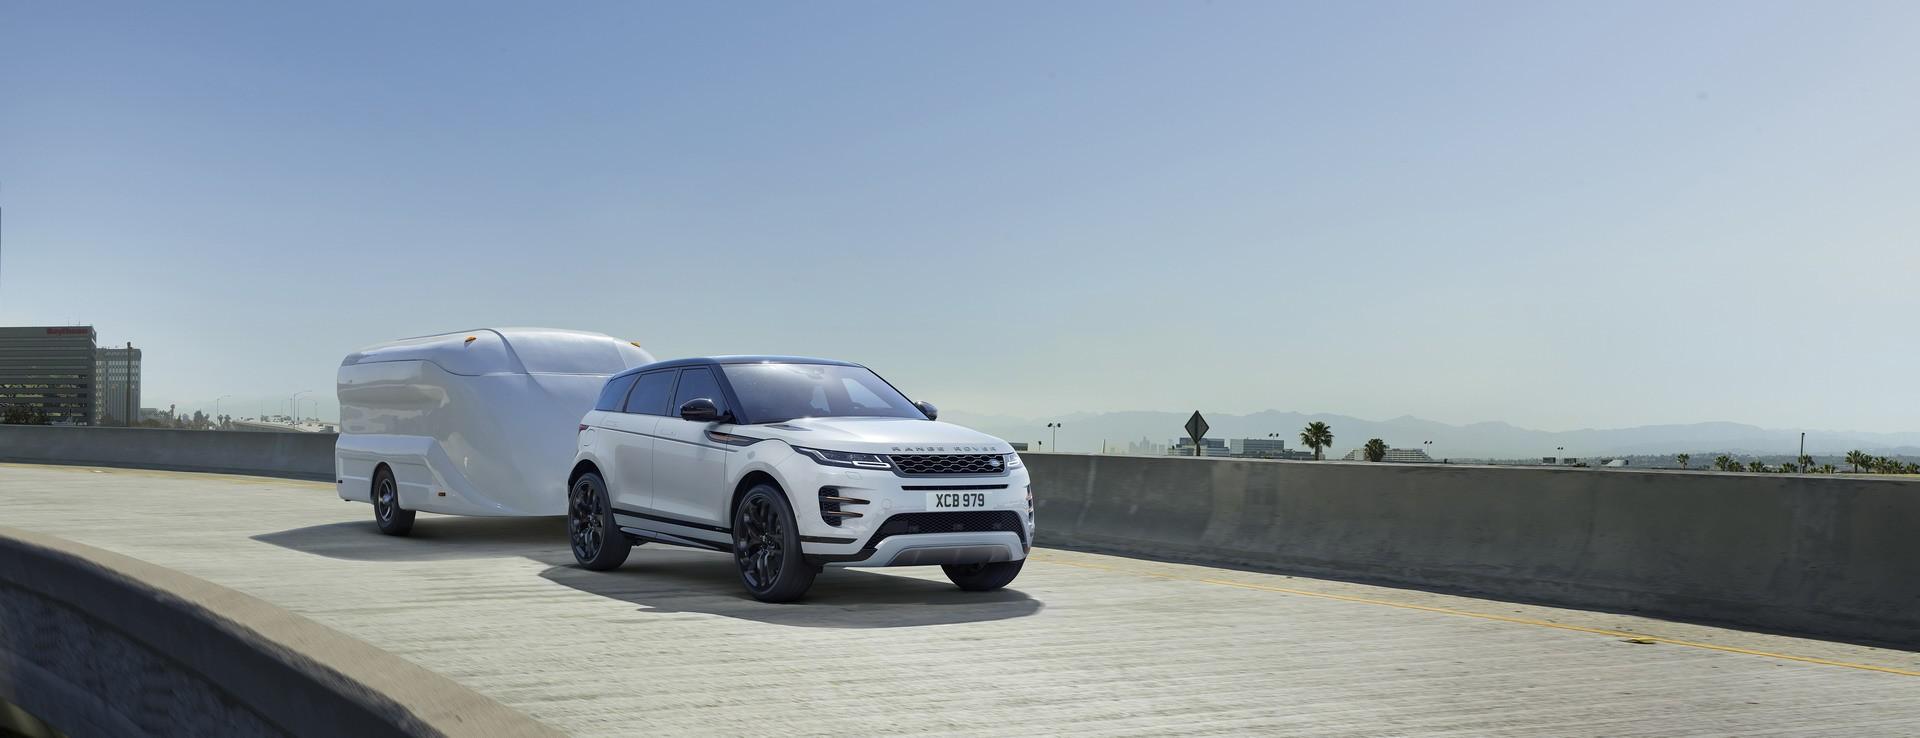 hight resolution of  2020 range rover evoque